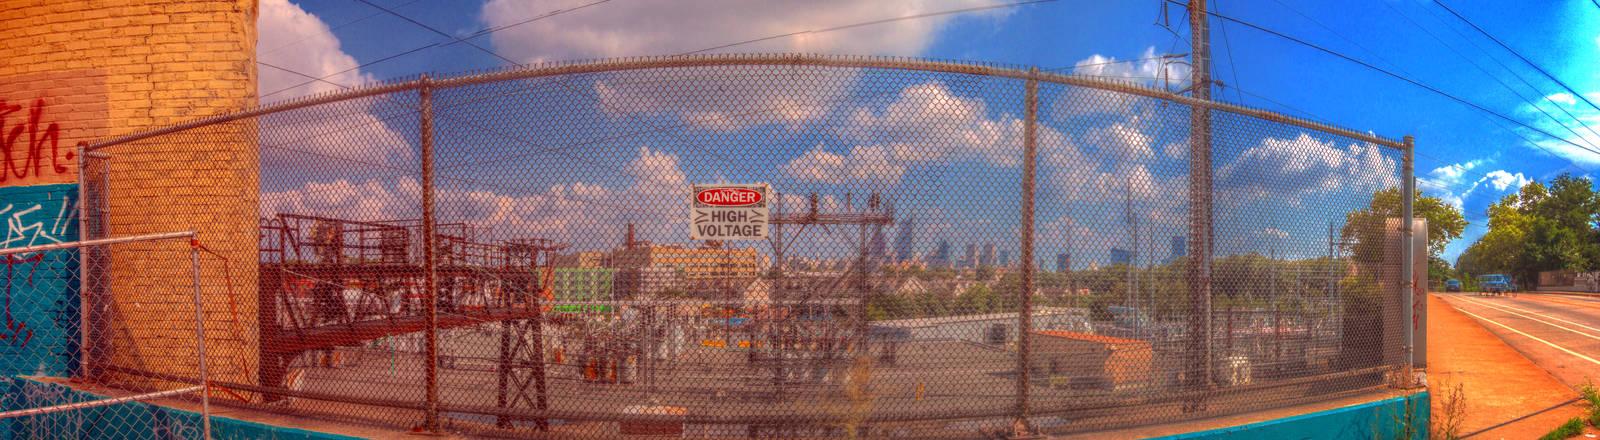 Panorama 3800 hdr pregamma 1 mantiuk06 contrast ma by bruhinb